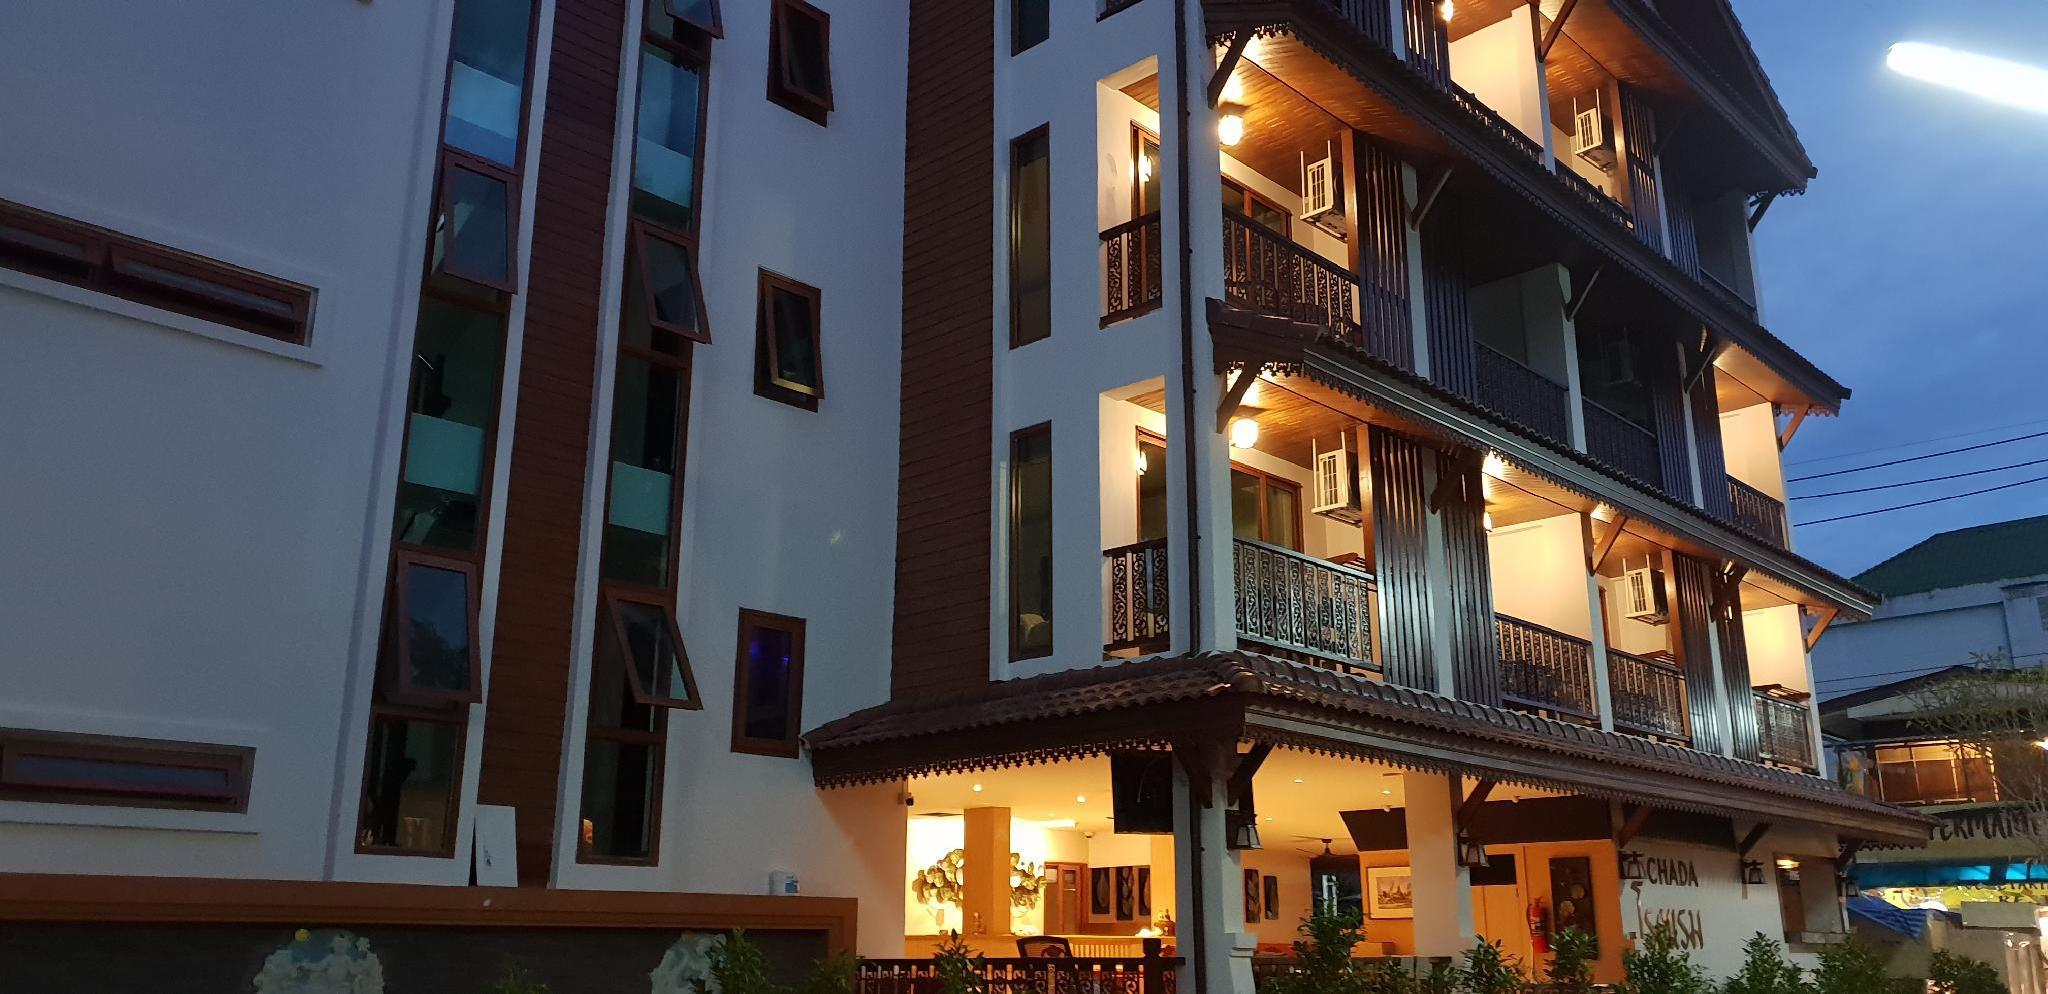 Chada Hotel,Chada Hotel